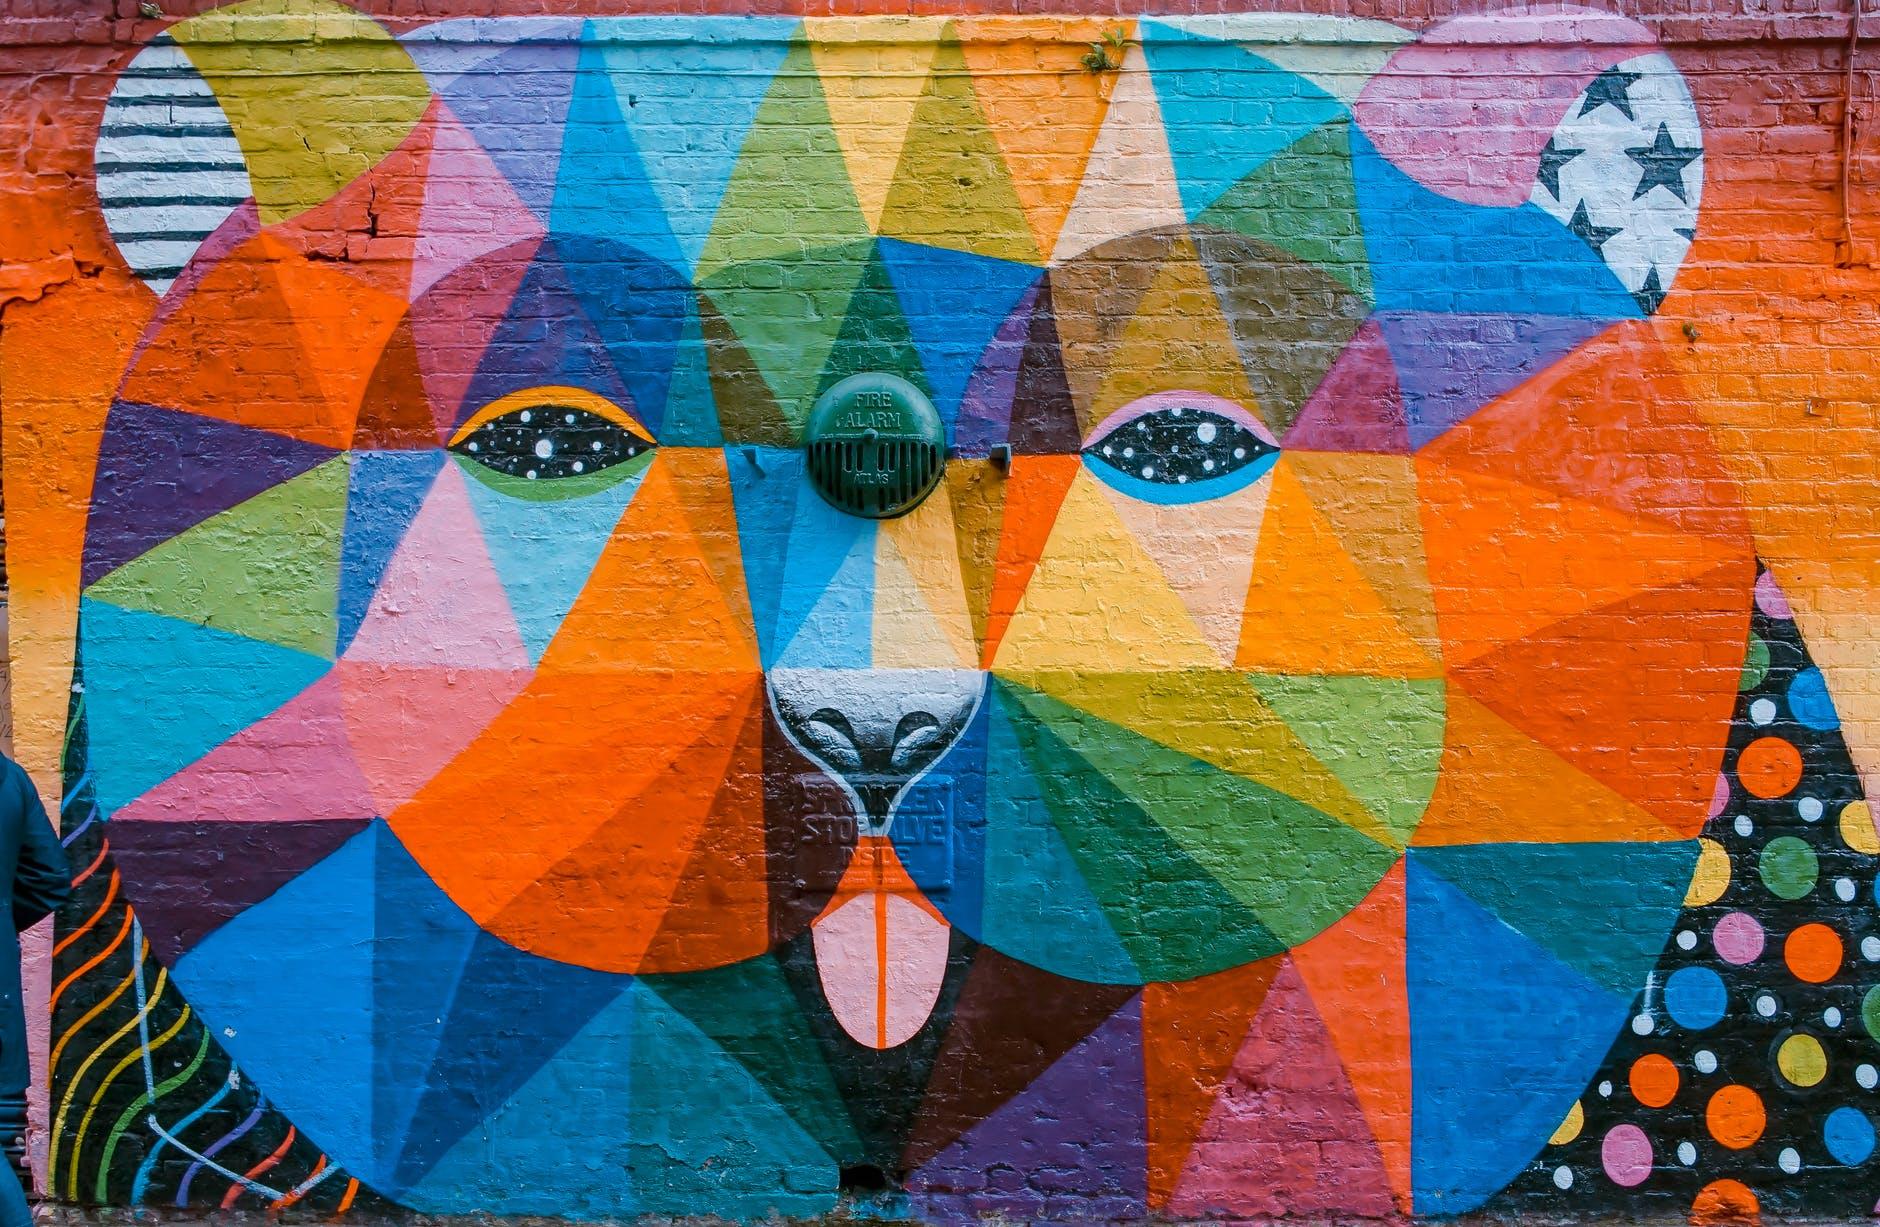 Contemporary Urban Artists Who Practice Rural-Urban Art